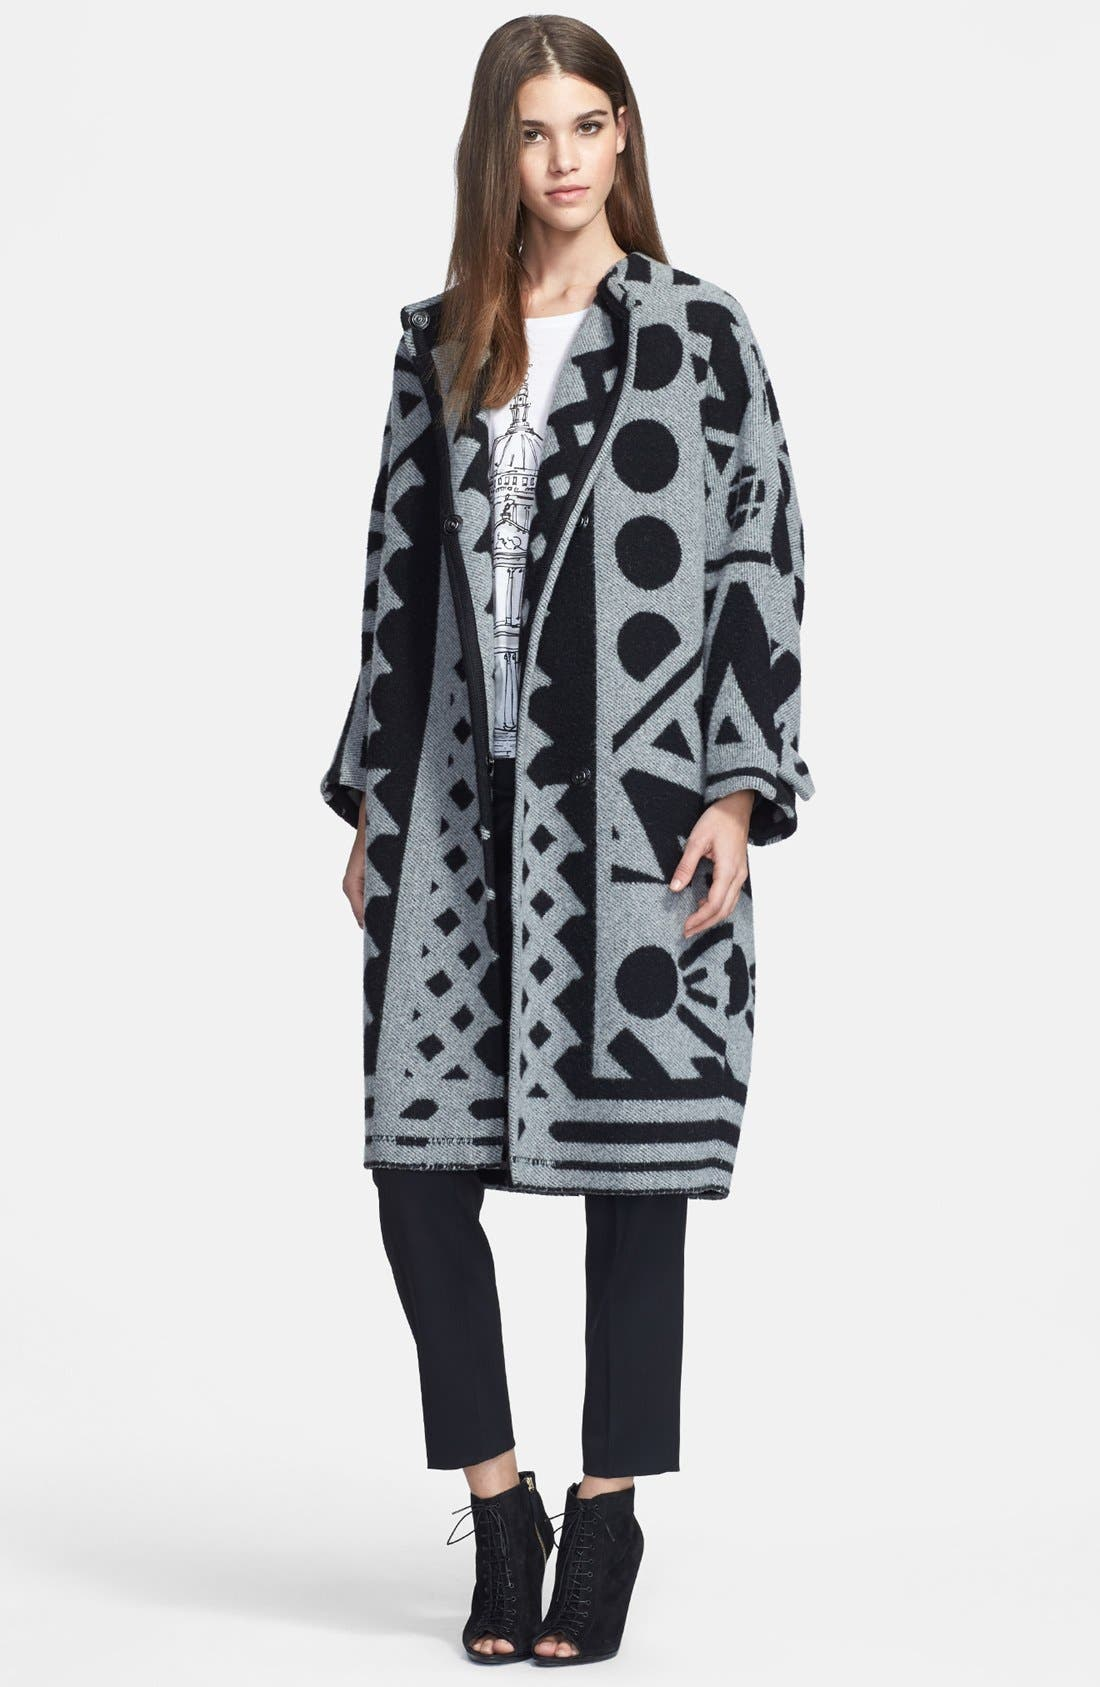 Alternate Image 1 Selected - Burberry Prorsum Jacquard Wool & Cashmere Blanket Coat